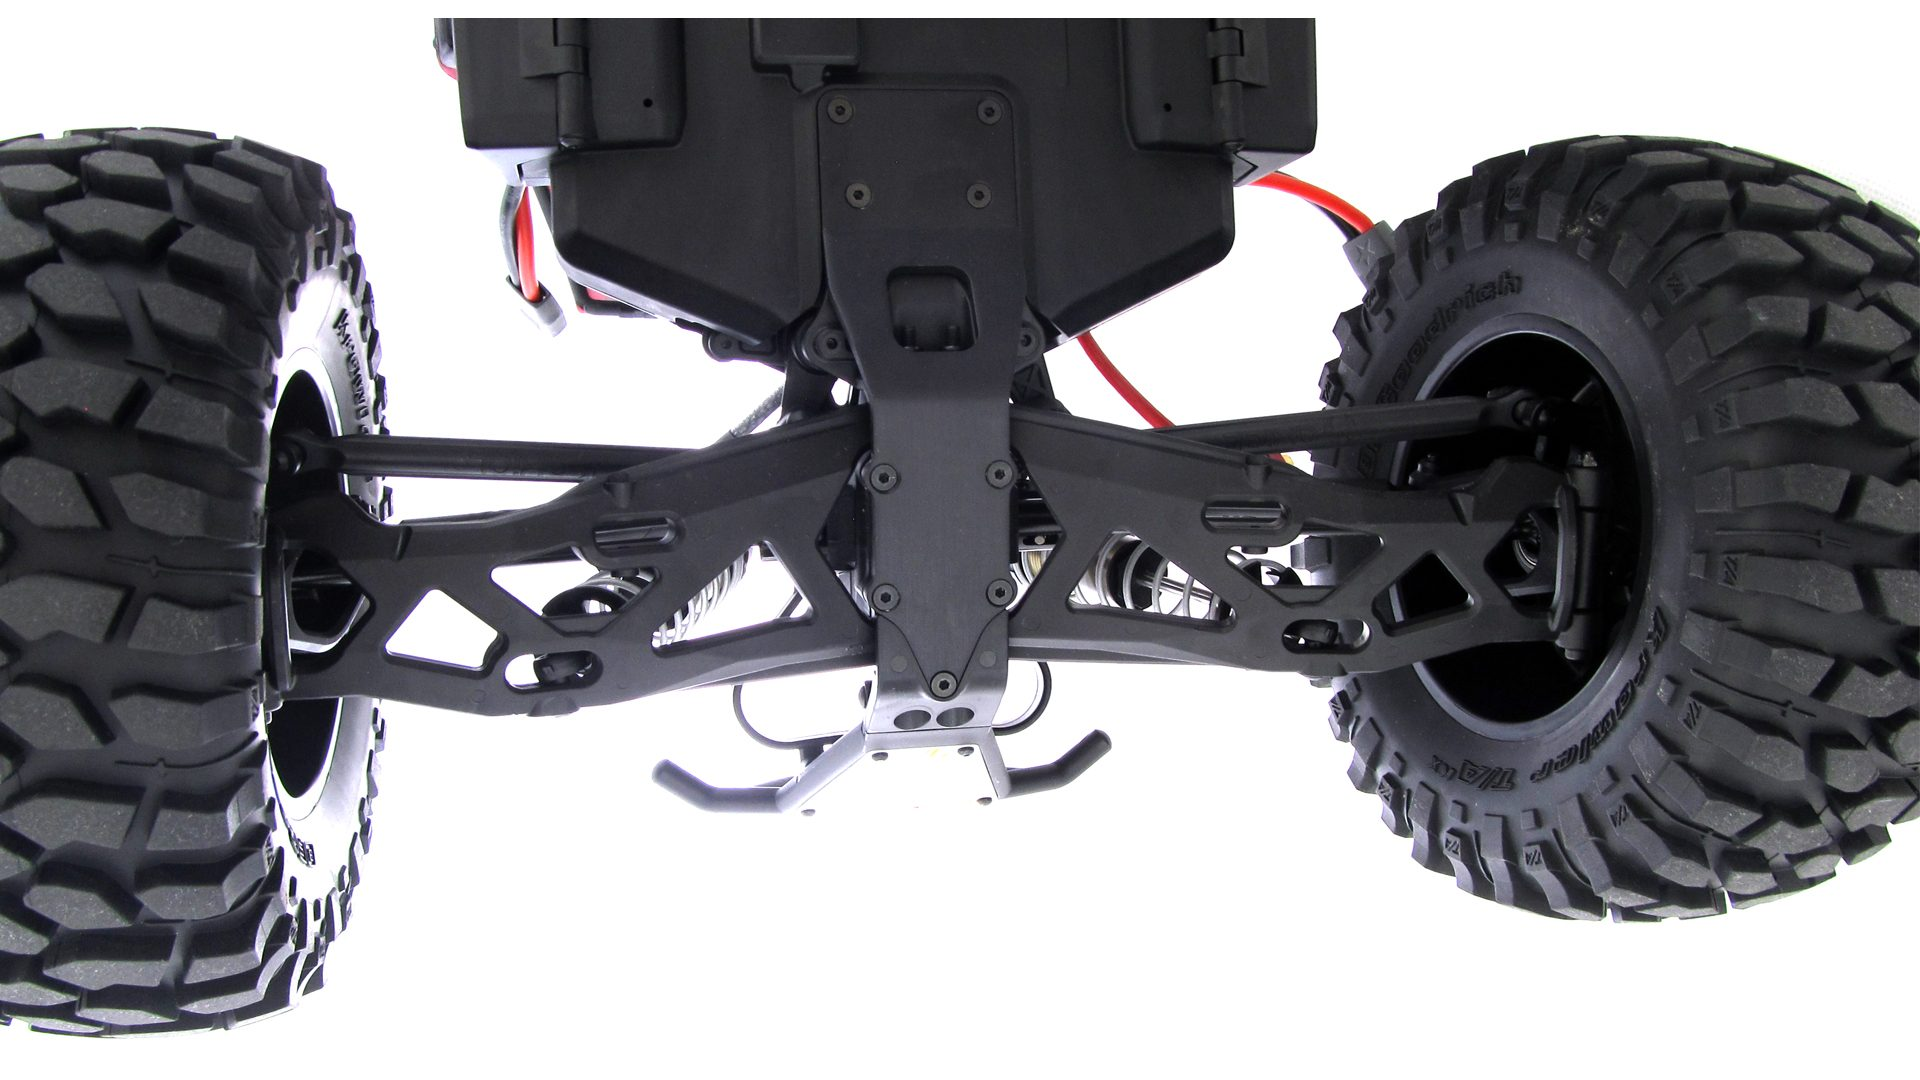 Yeti-Reifen-Motor-Aufhaengung_6